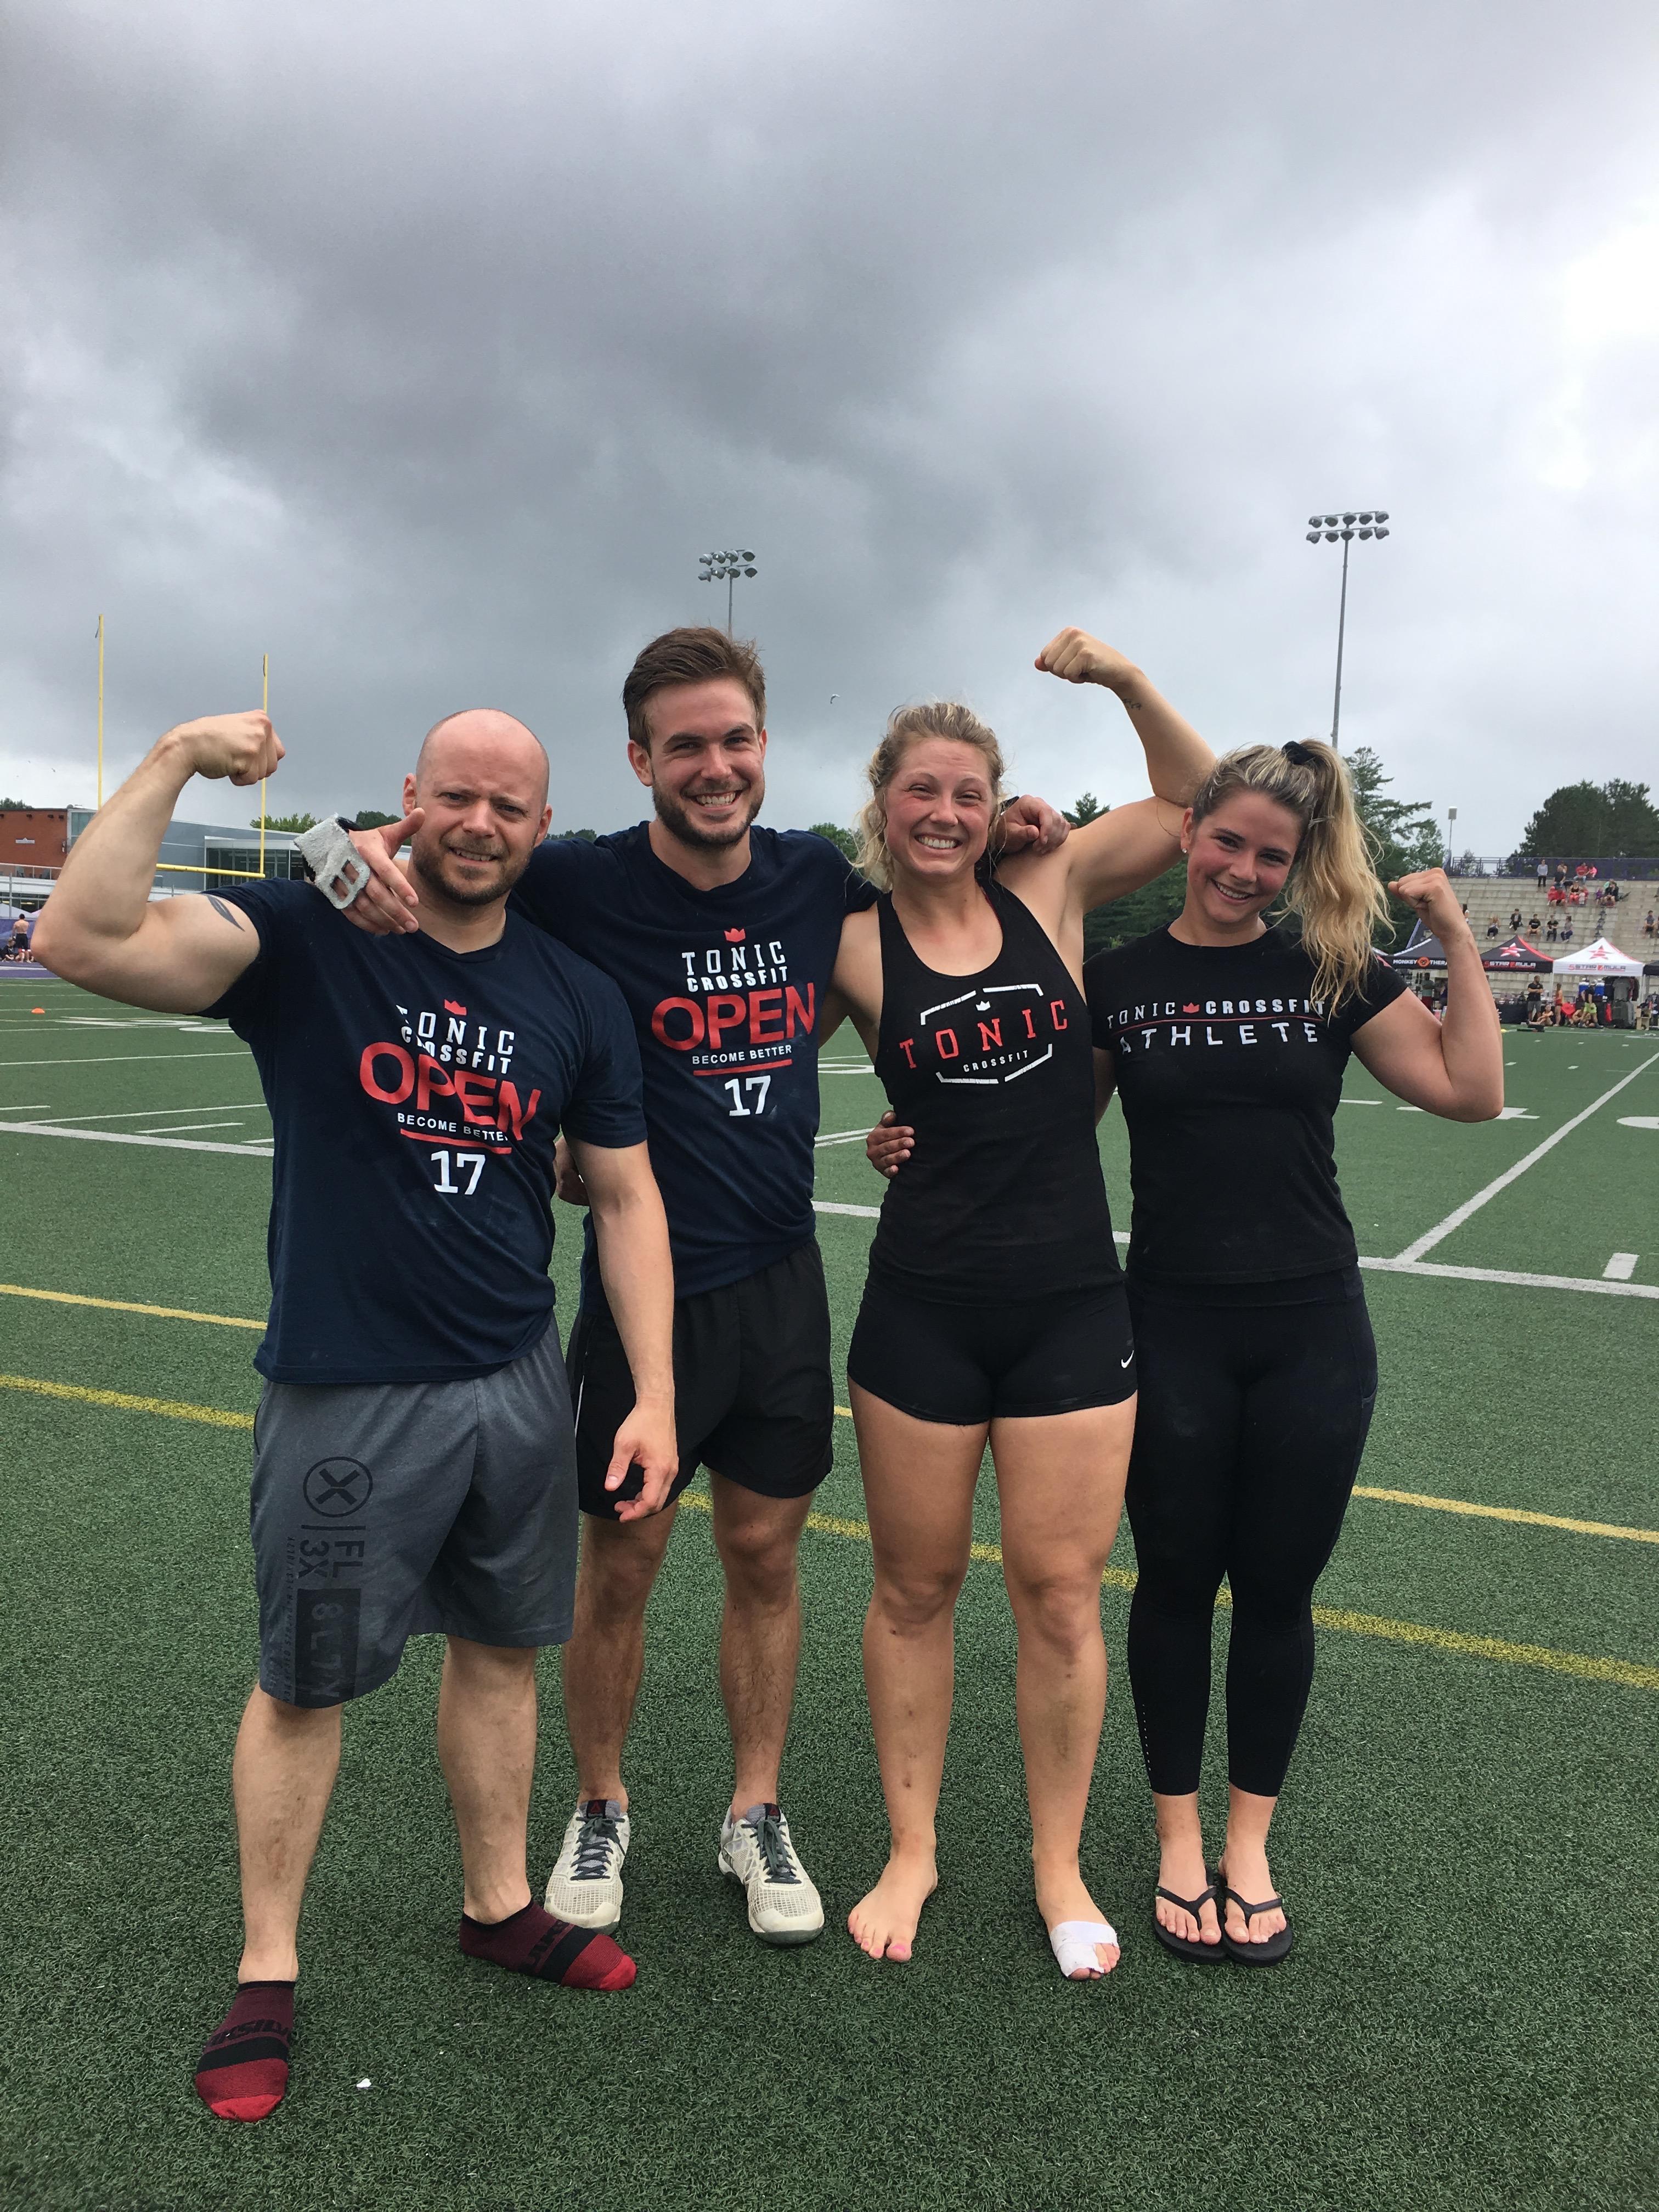 crossfit sport challenge équipe entrainement programme exercices competition